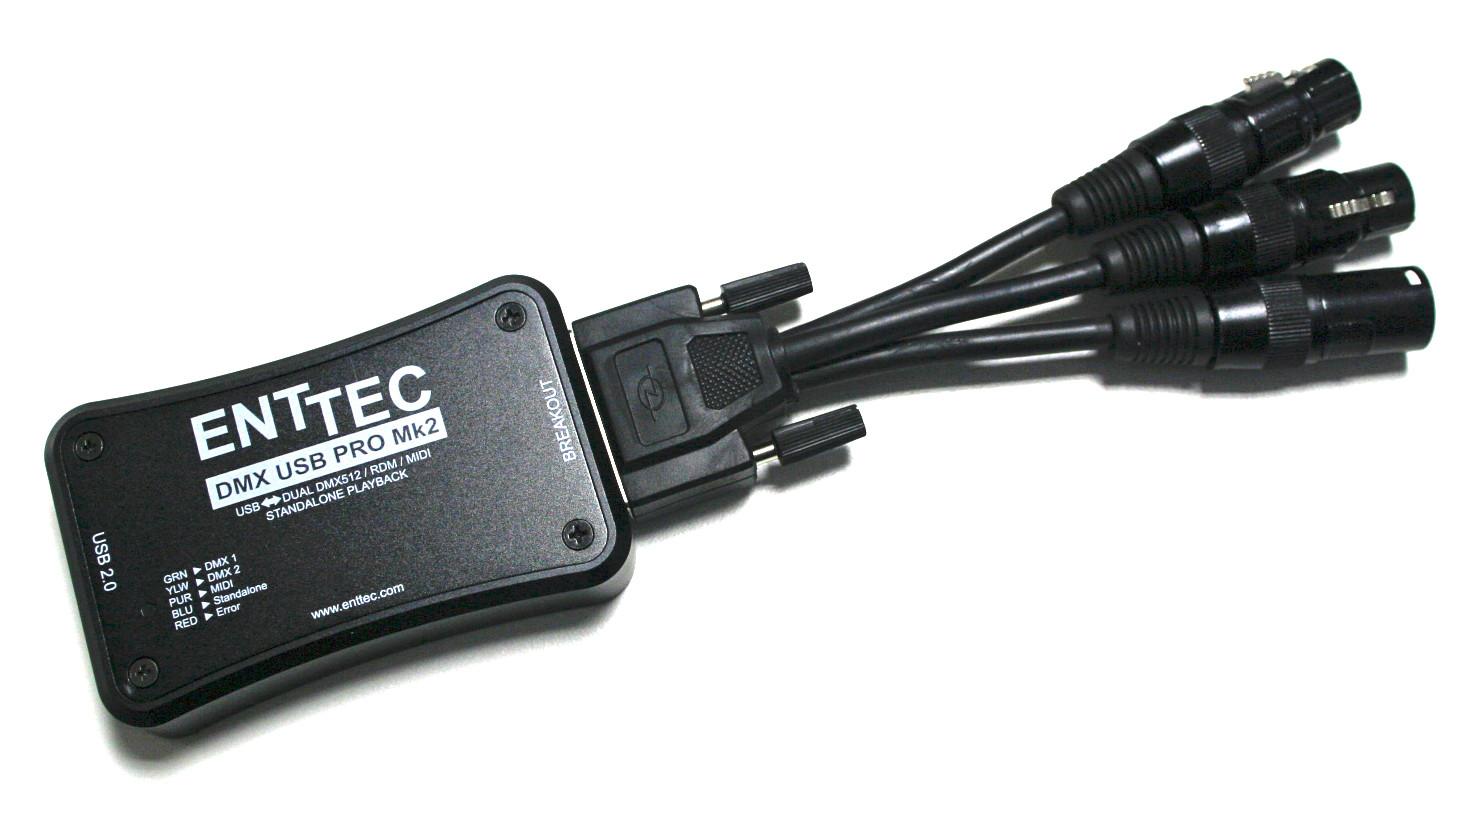 DMX USB PRO MK2 - Interlite